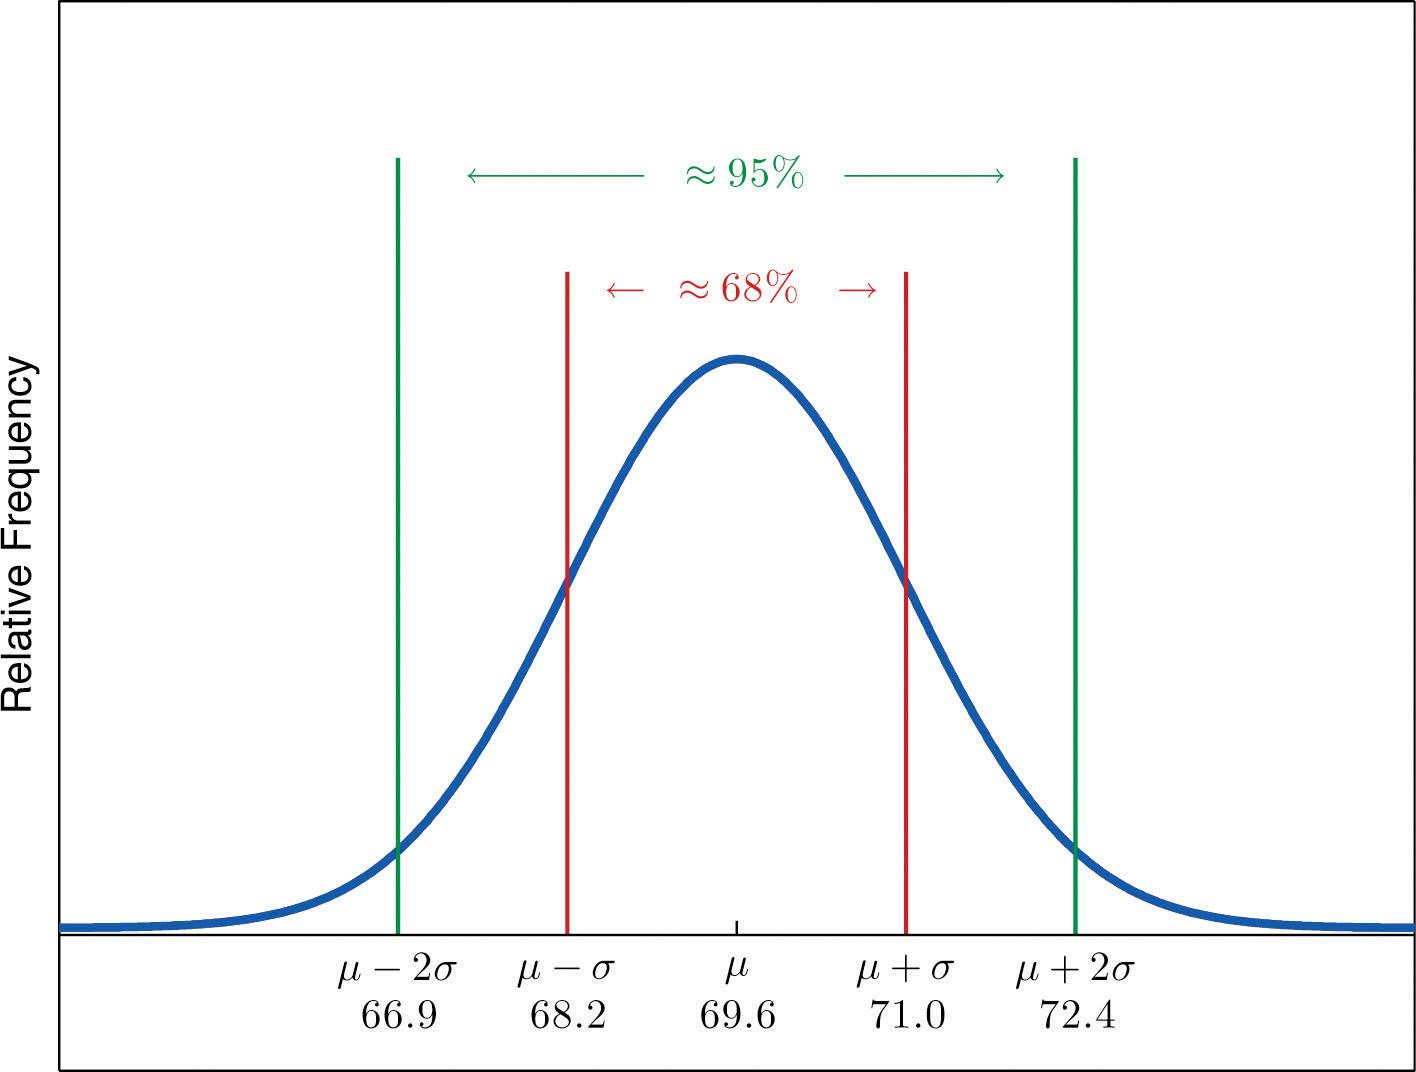 worksheet Empirical Rule Worksheet empirical rule worksheet humorholics introductory statistics 1 0 flatworld